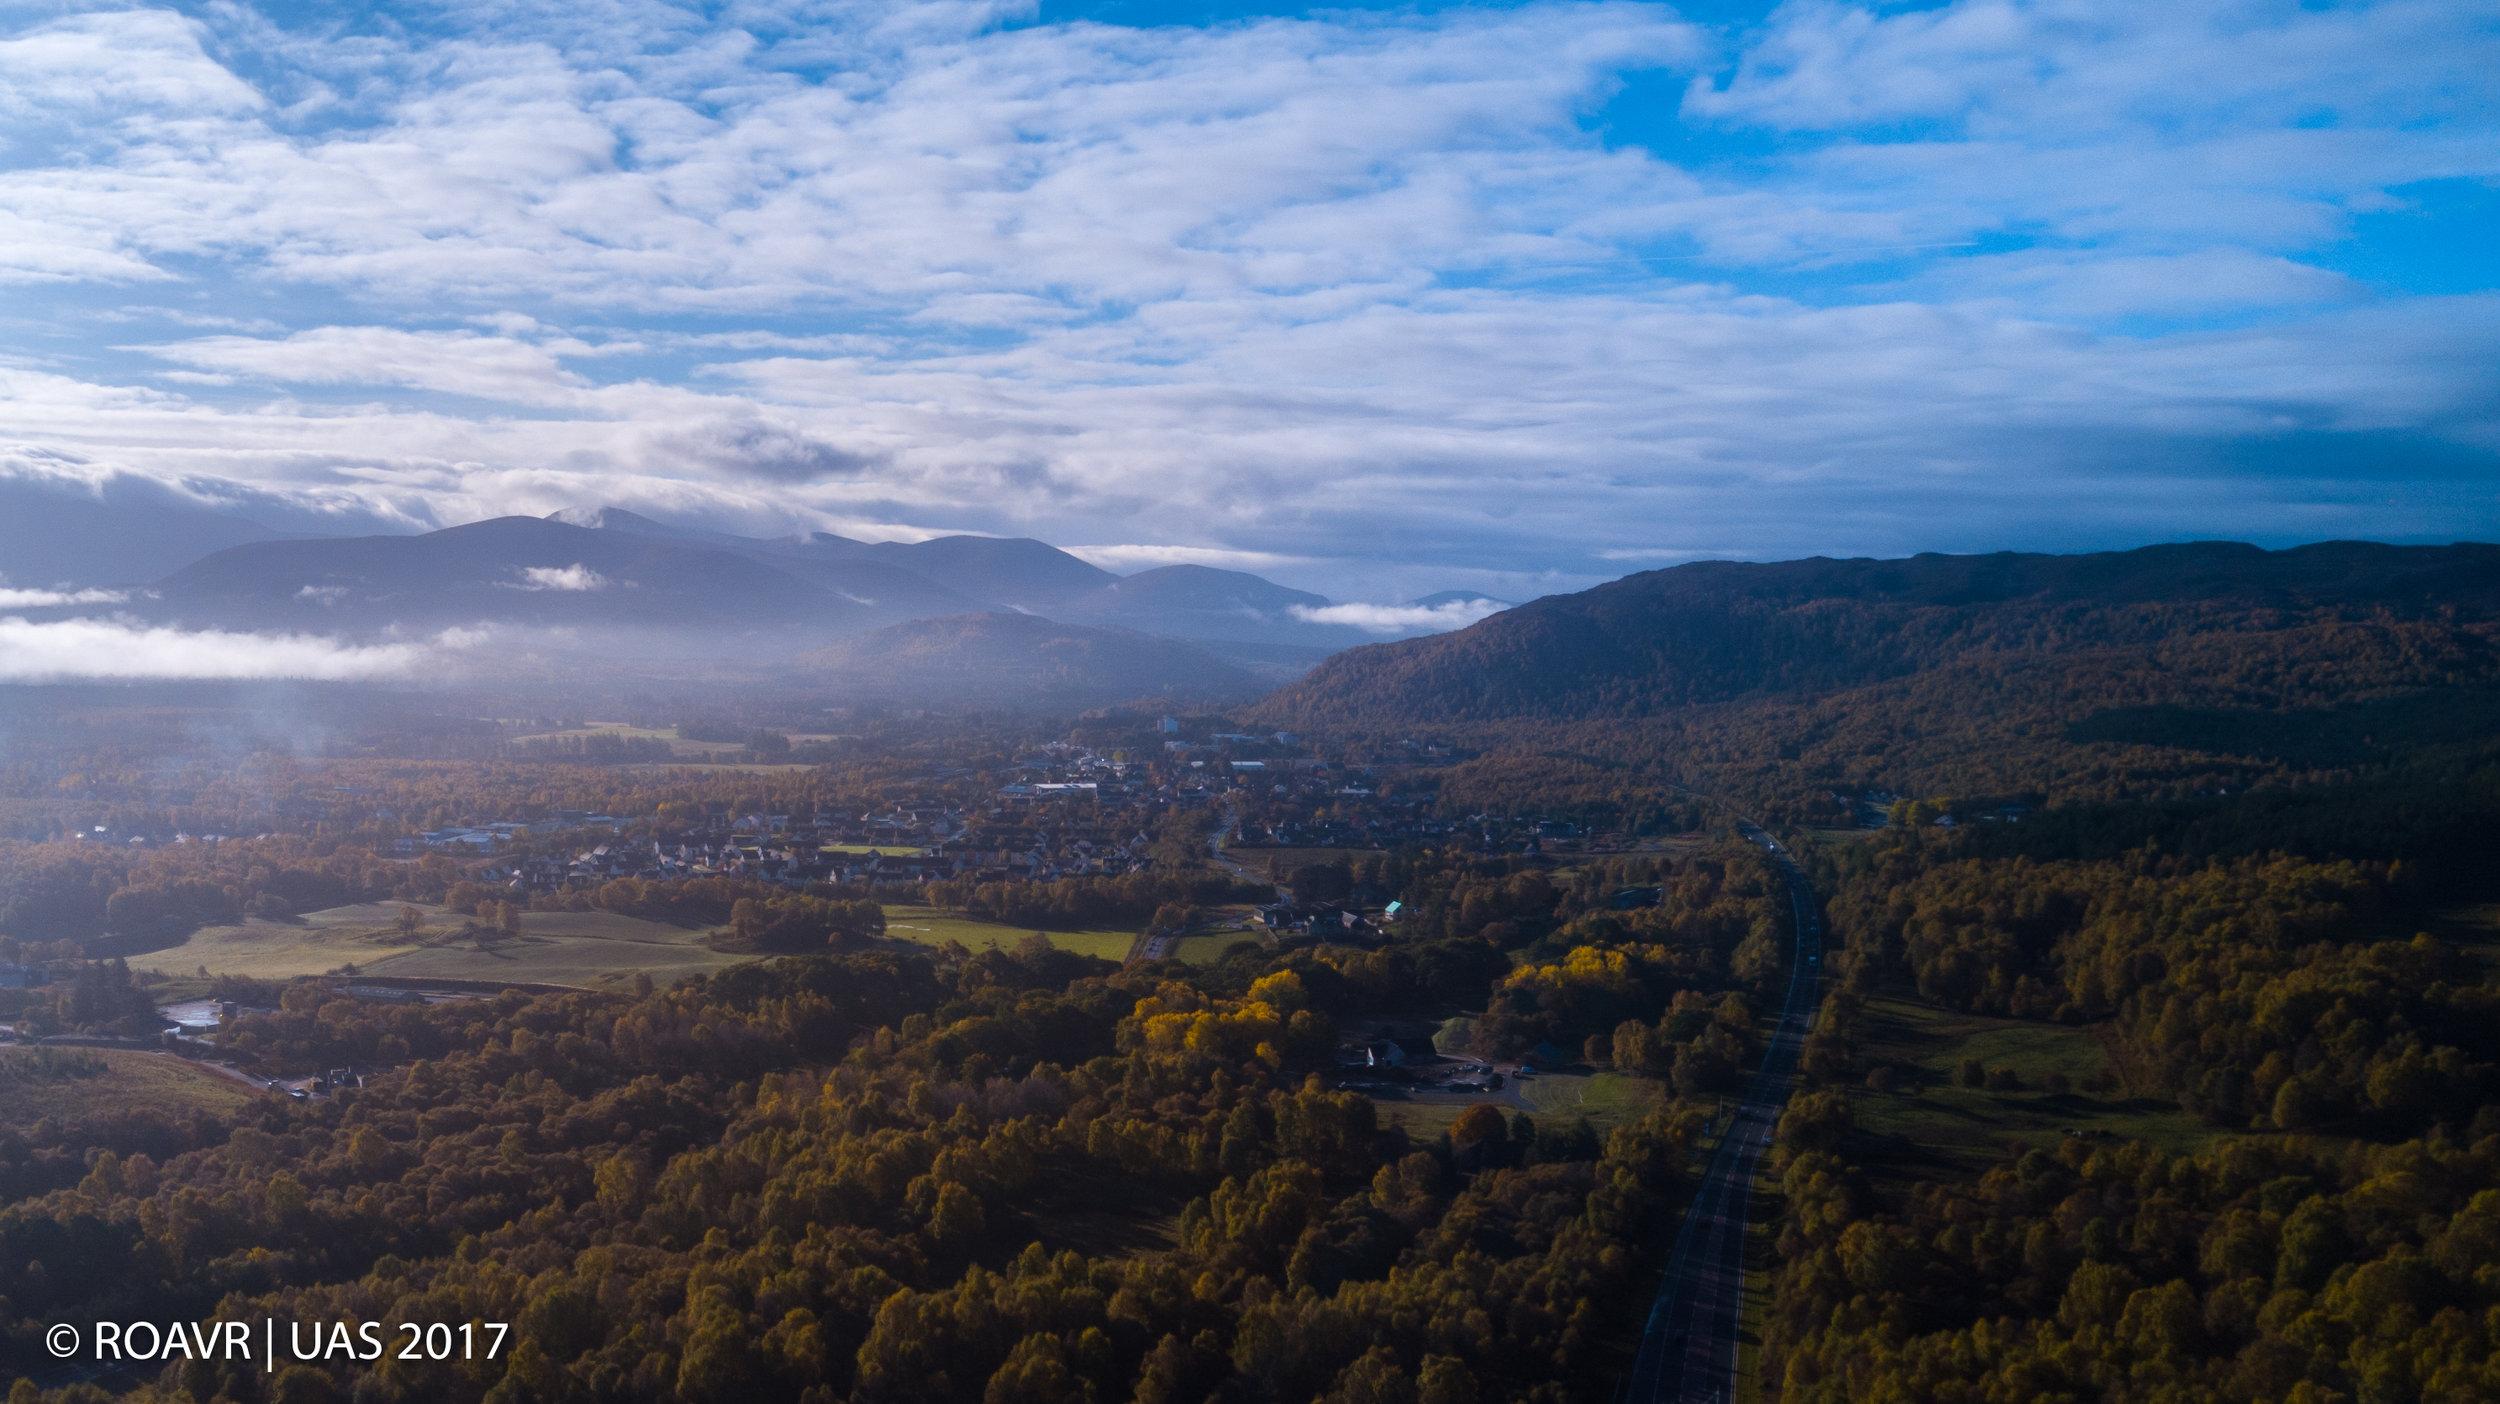 Aviemore - Cairngorm National Park